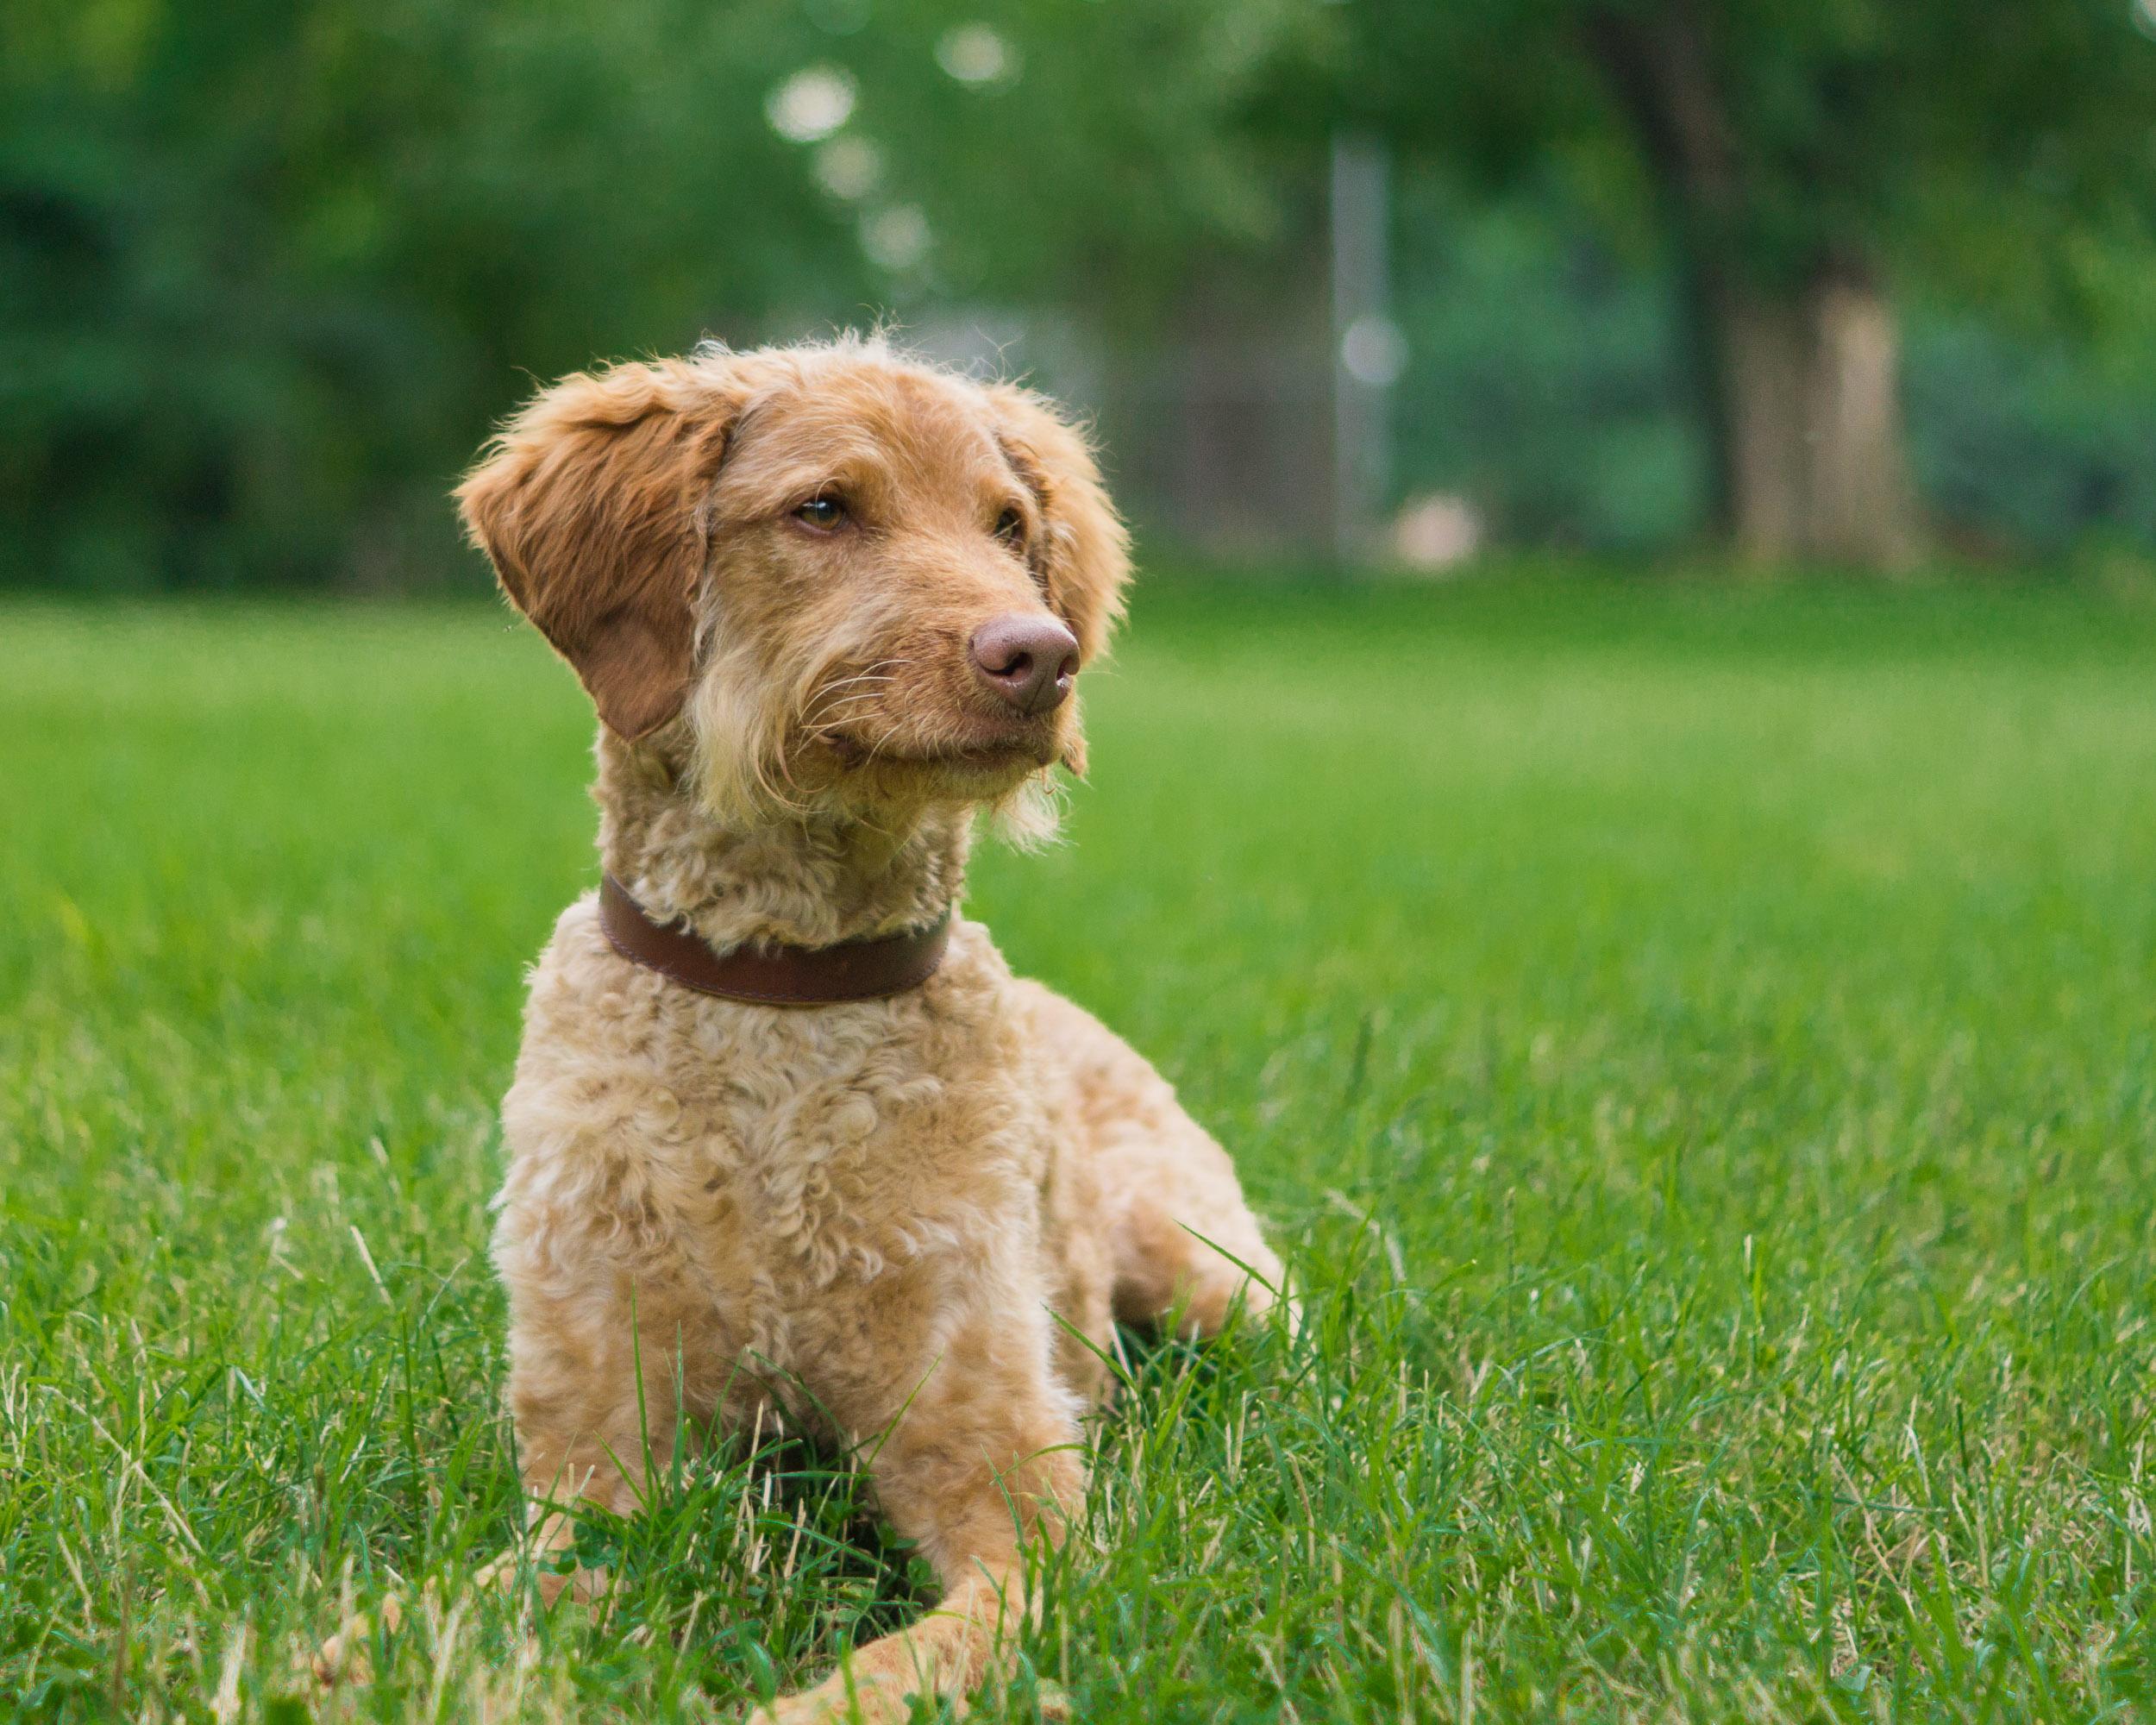 Dog Photographer in Washington, DC